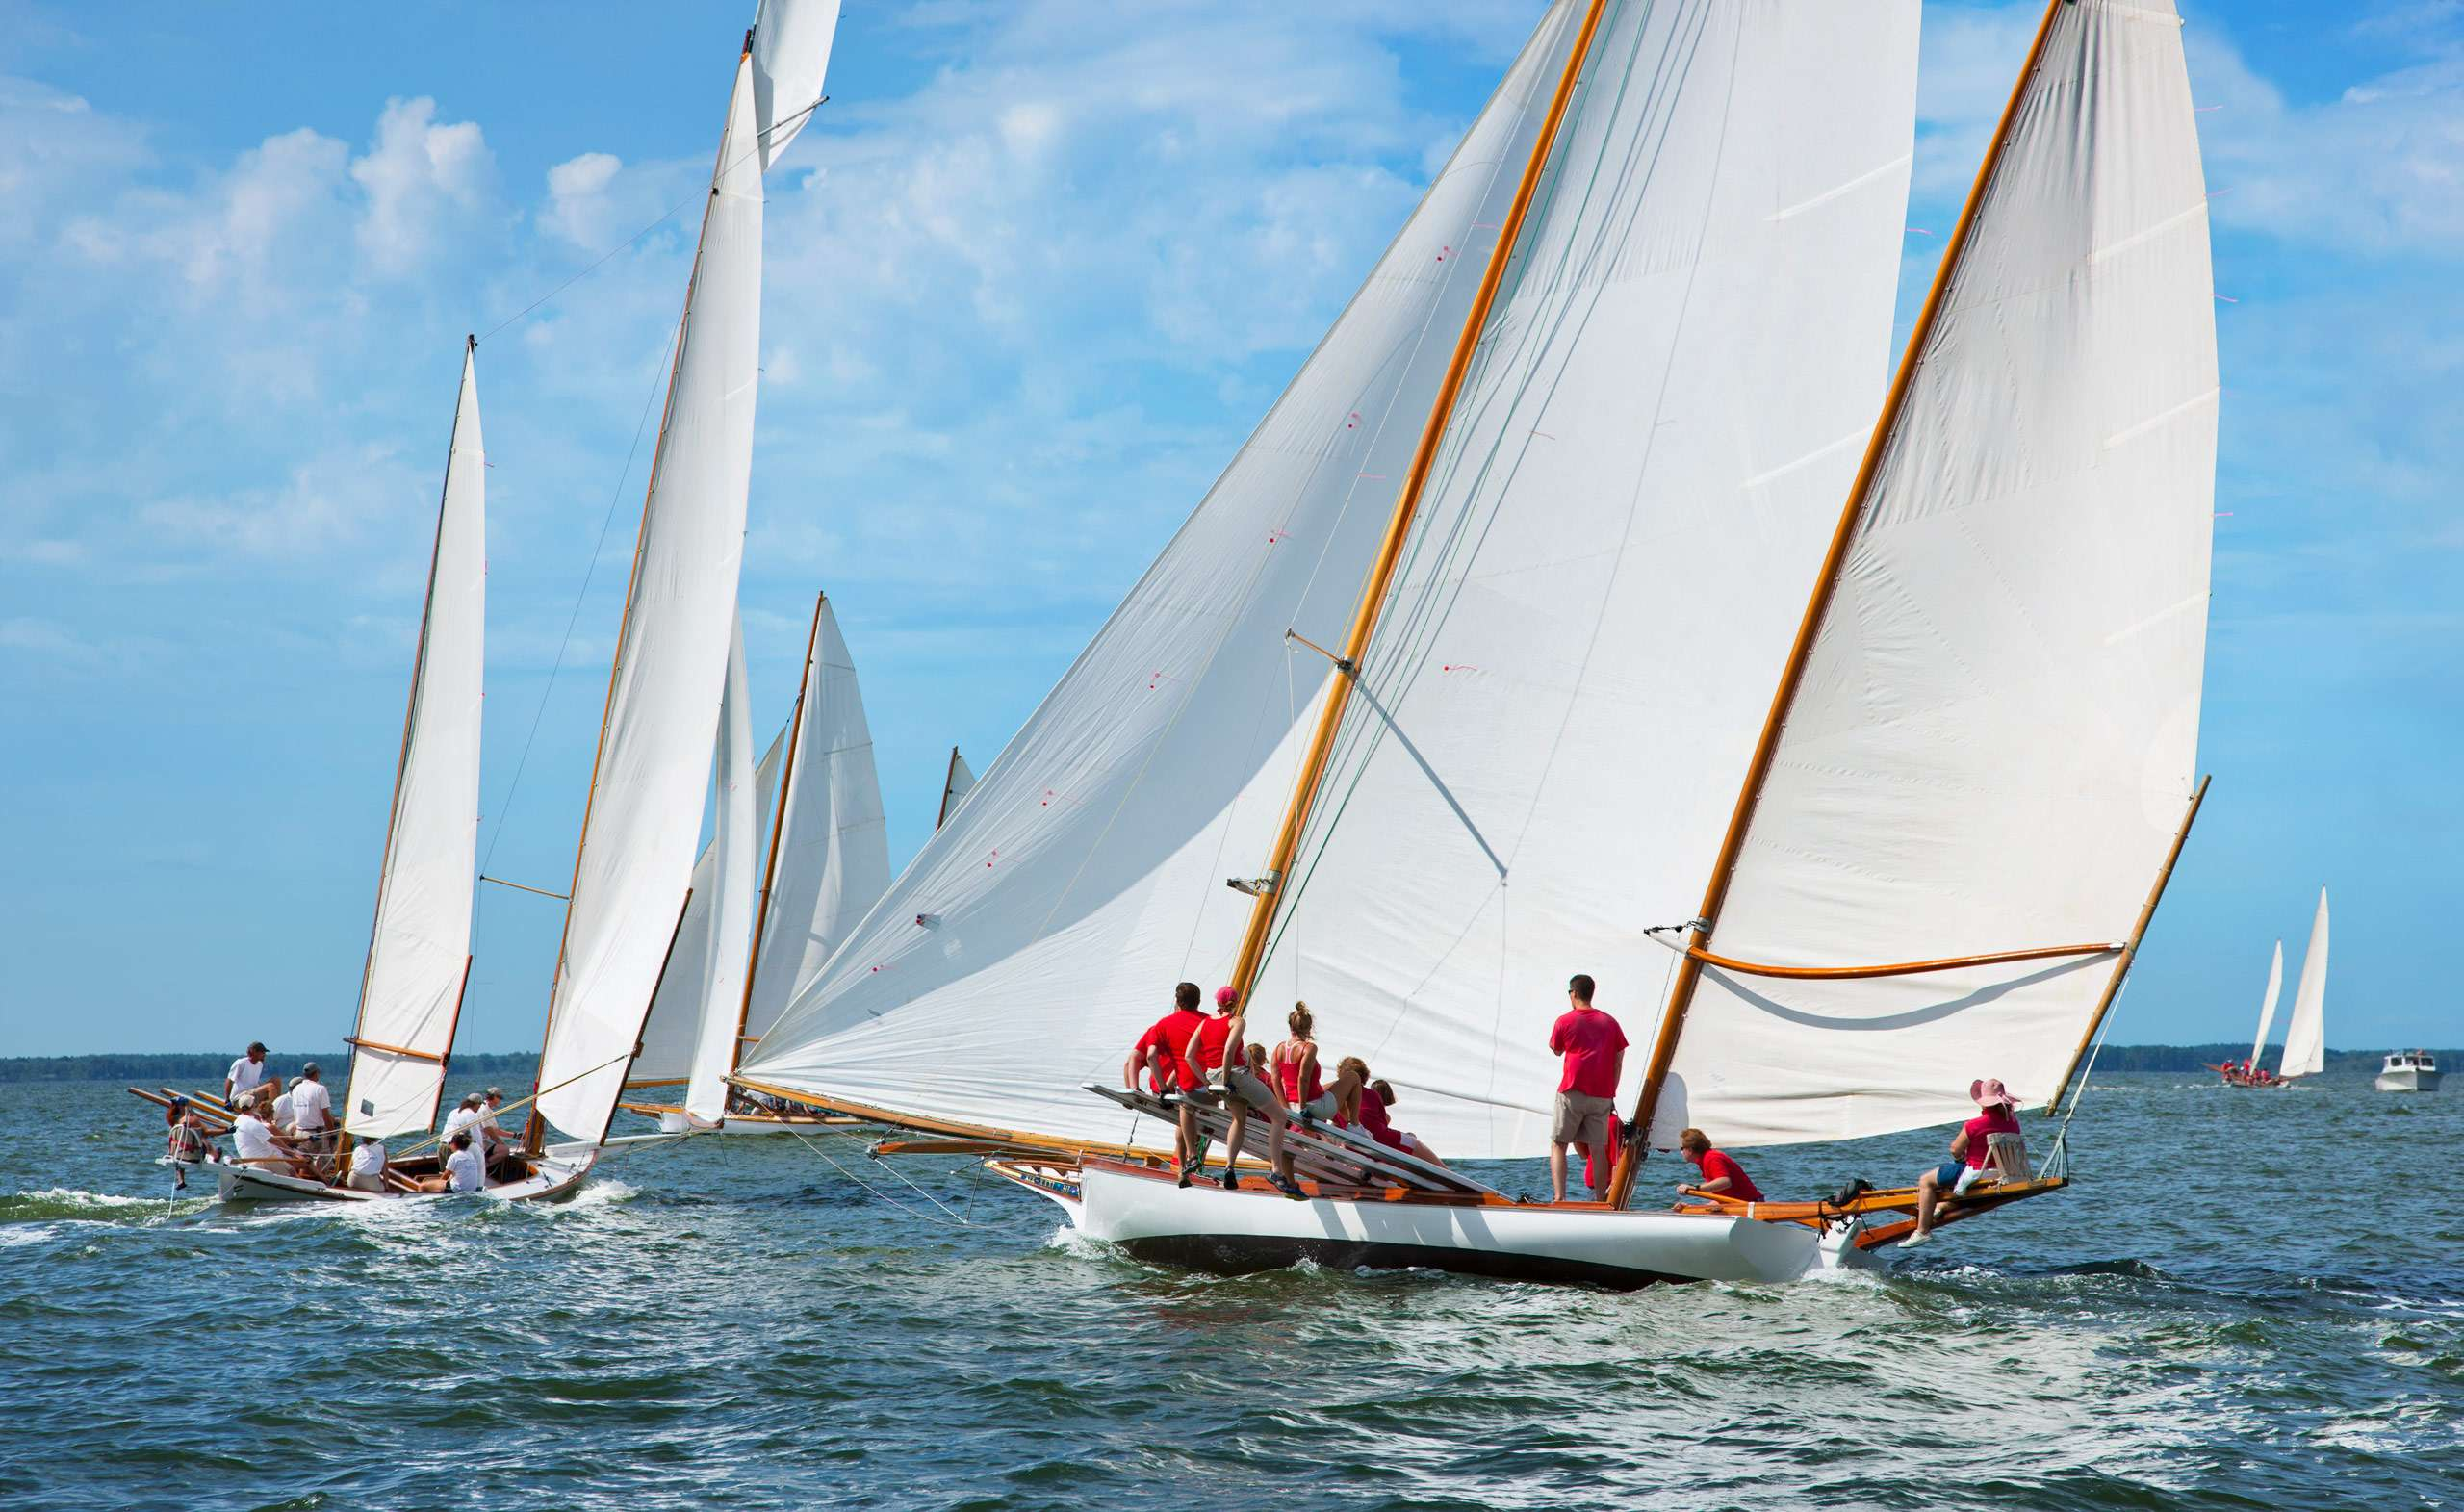 PORTFOLIO - Sailing - Log Canoes #24   PCG580